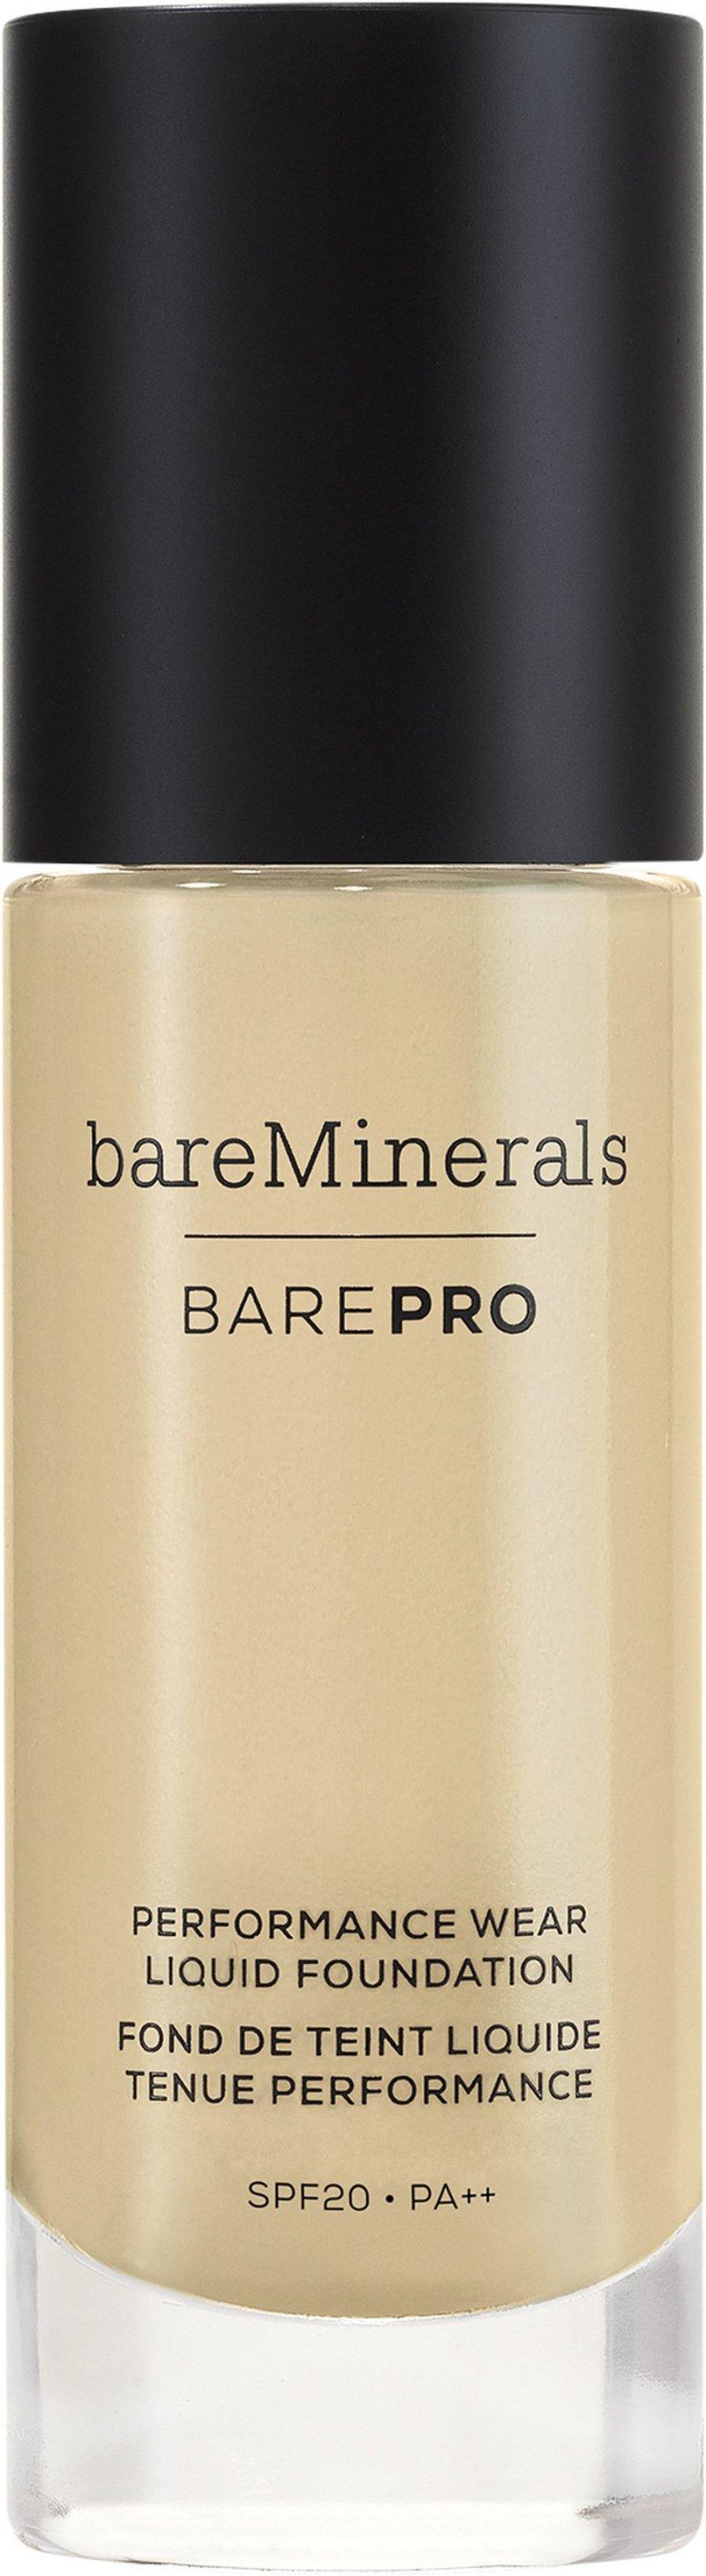 Image of   Bareminerals Foundation - Barepro Performance Wear Liquid - Warm Natural 12